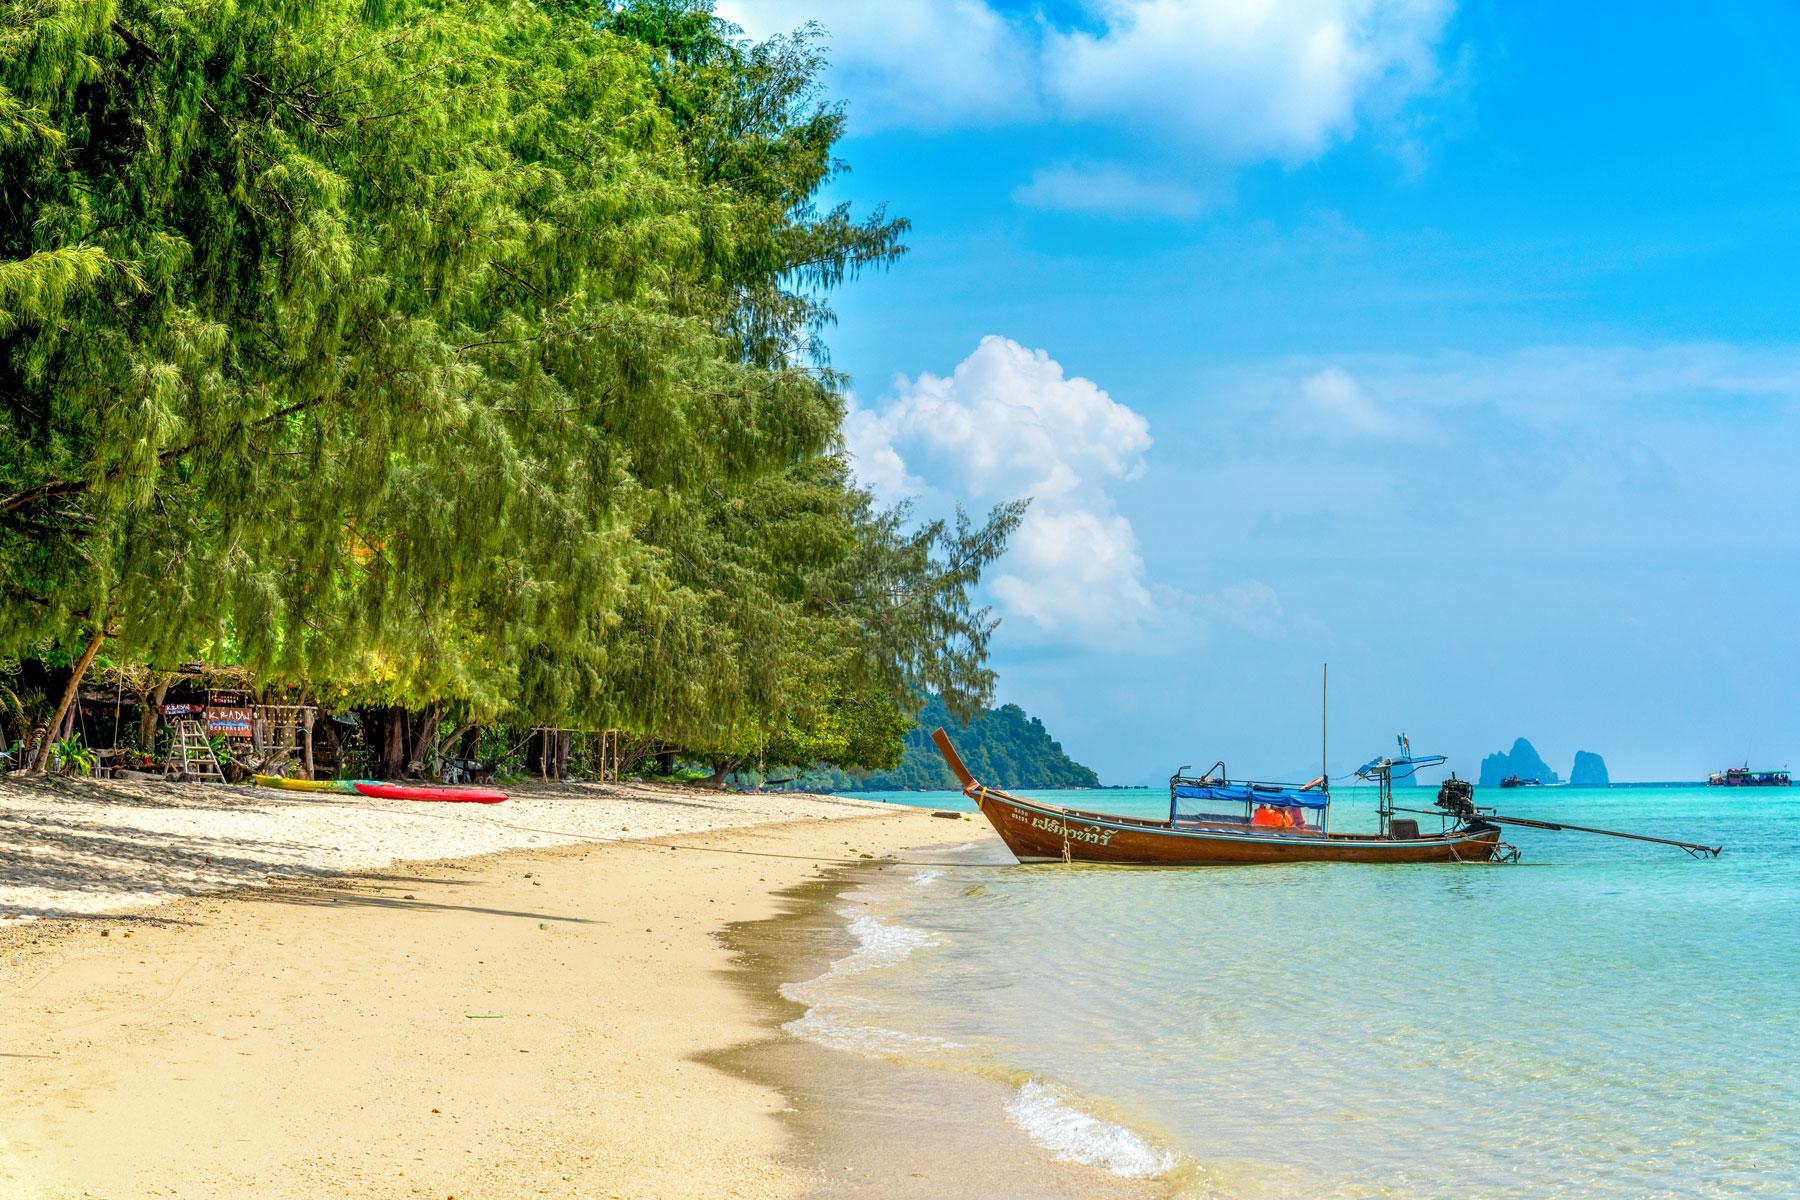 04_Thailand_Snorkeling_Diving_Koh_Kraden_PR_Trang-Ko-Kradan-Ko-Kradan-Beach-(2)